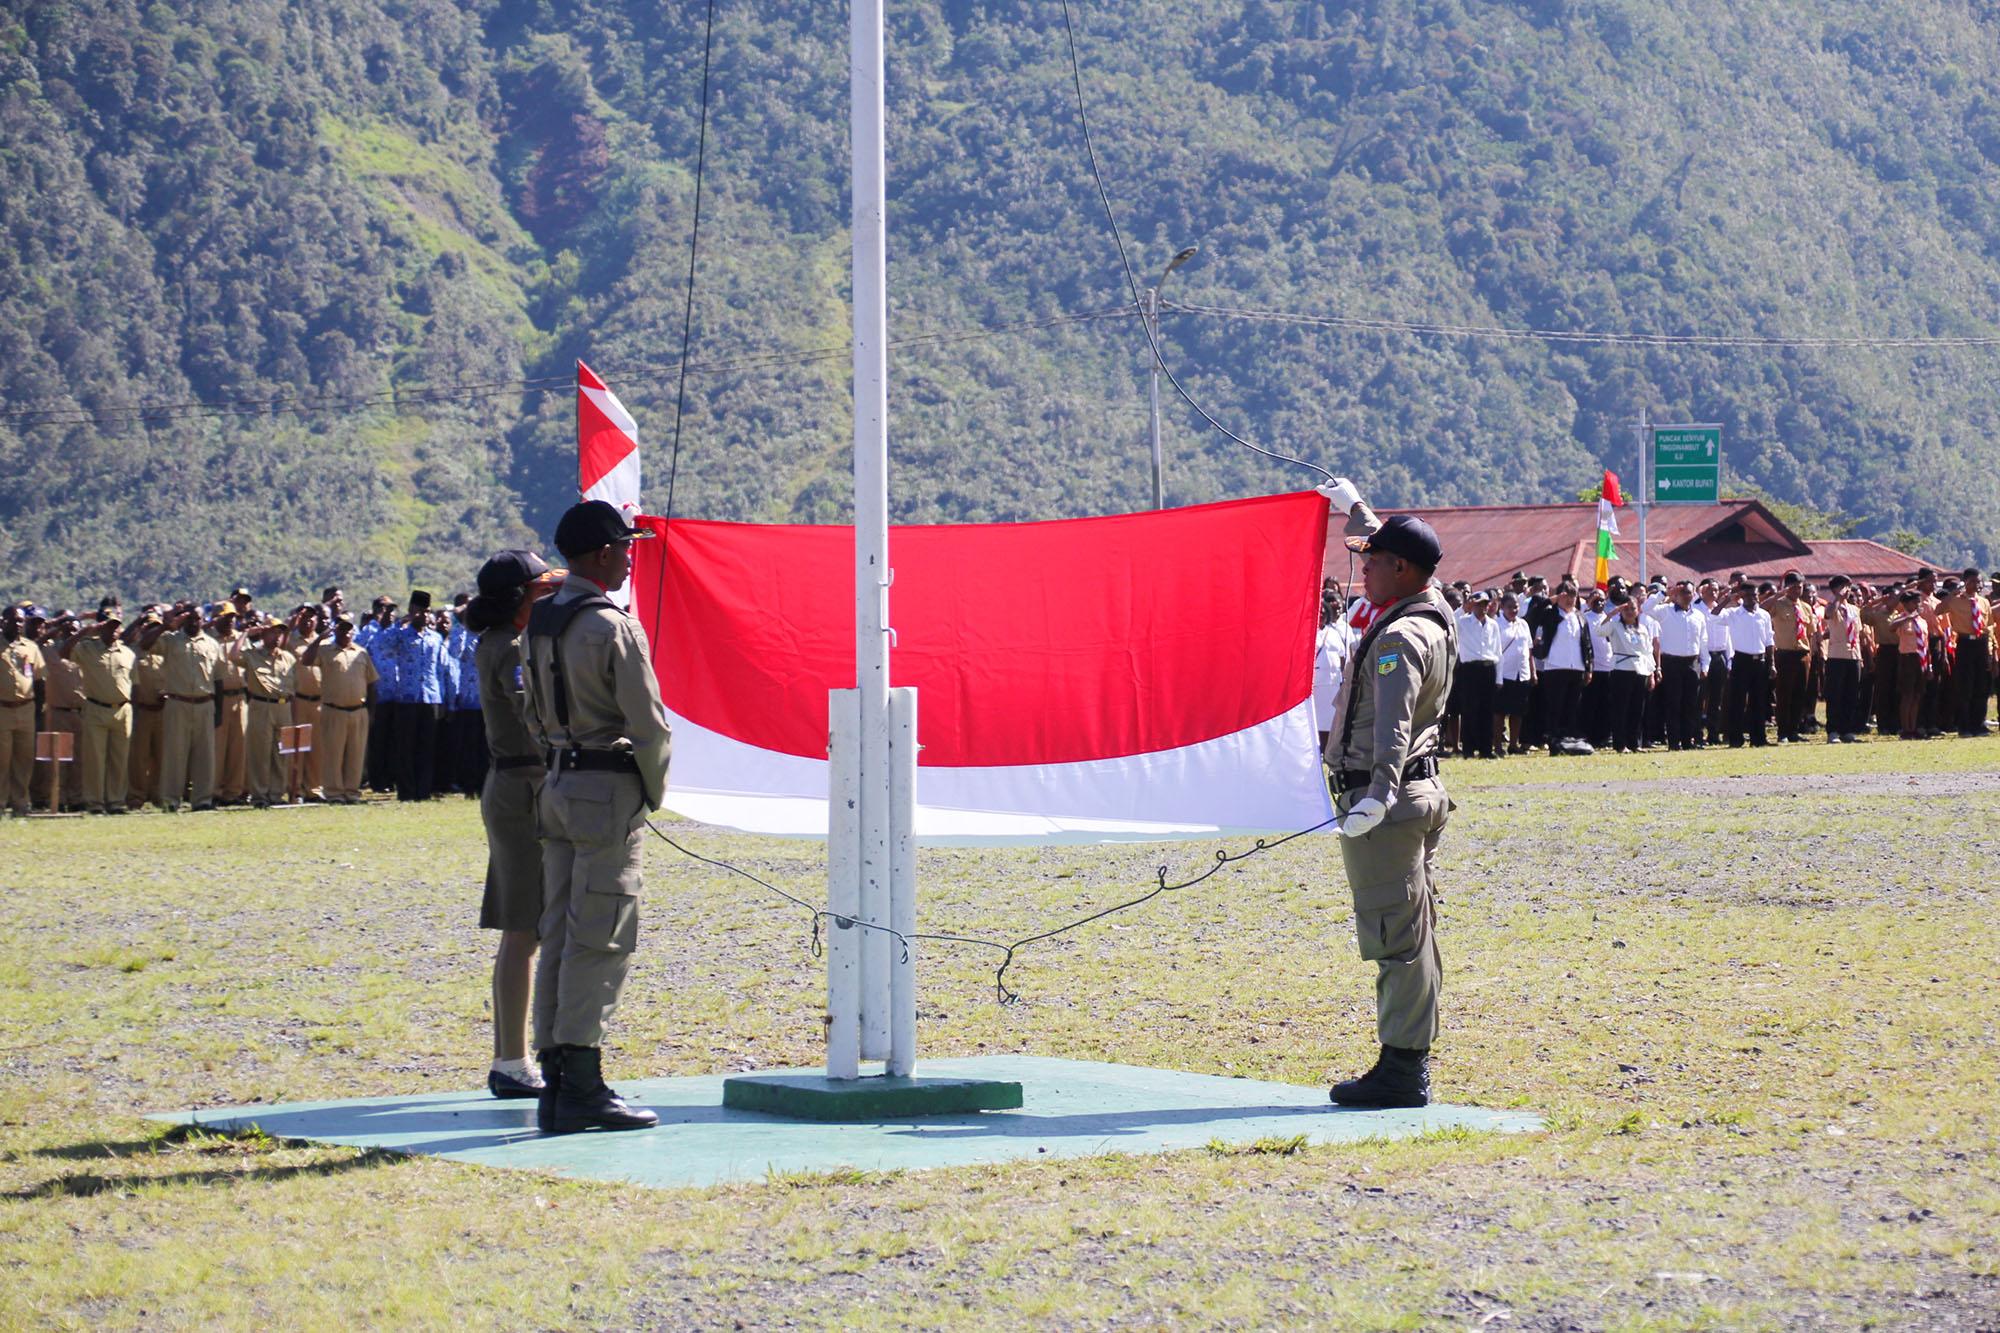 Penaikan bendera merah putih saat Upacara Bendera dalam rangka Hut Satpol PP ke - 68 di Kabupaten Puncak Jaya